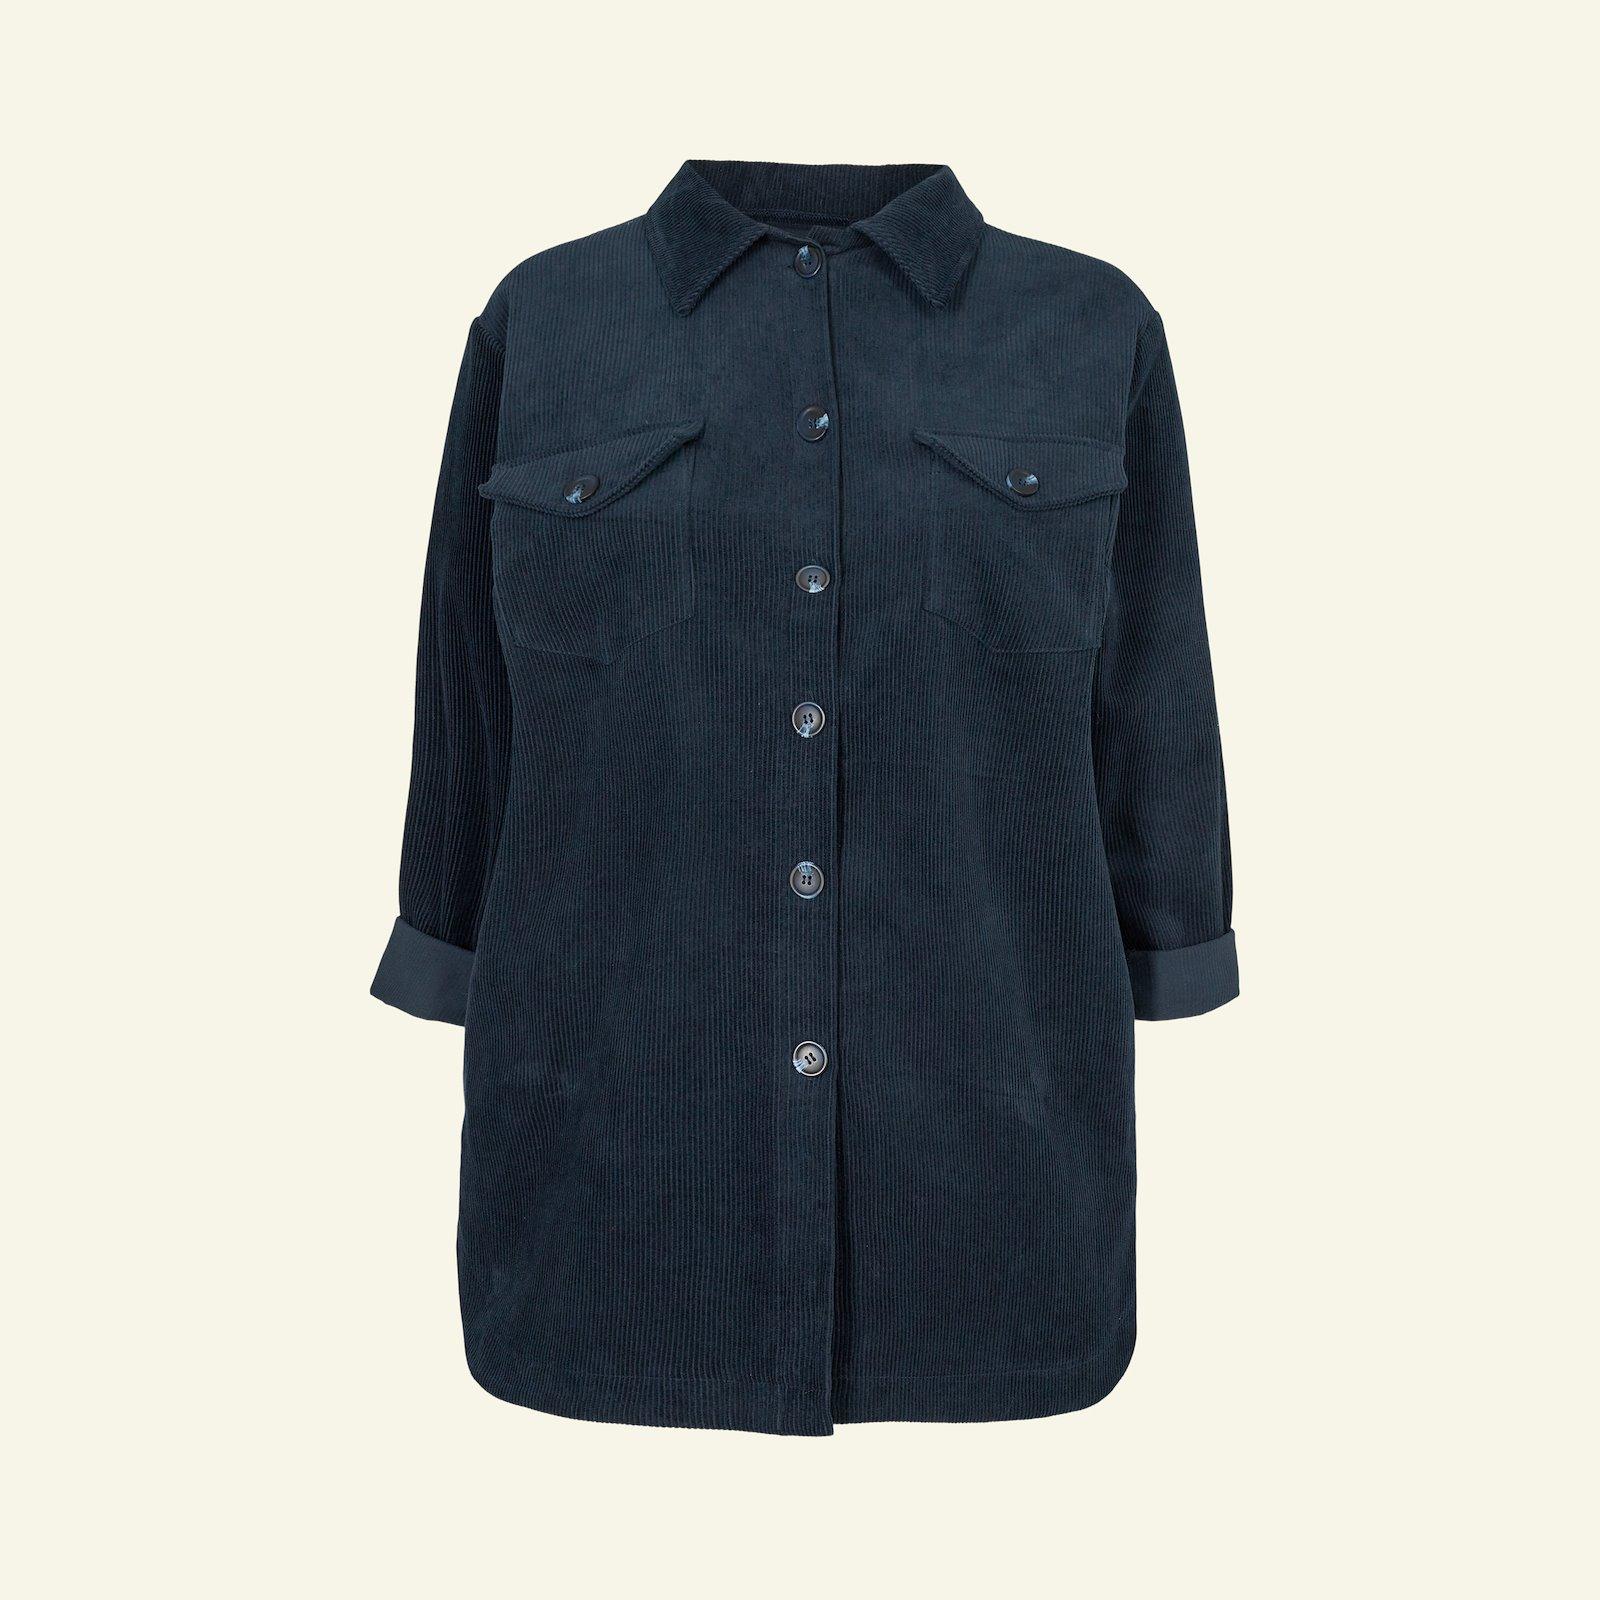 Shirt jacket, 60/32 p74001_430305_33118_sskit